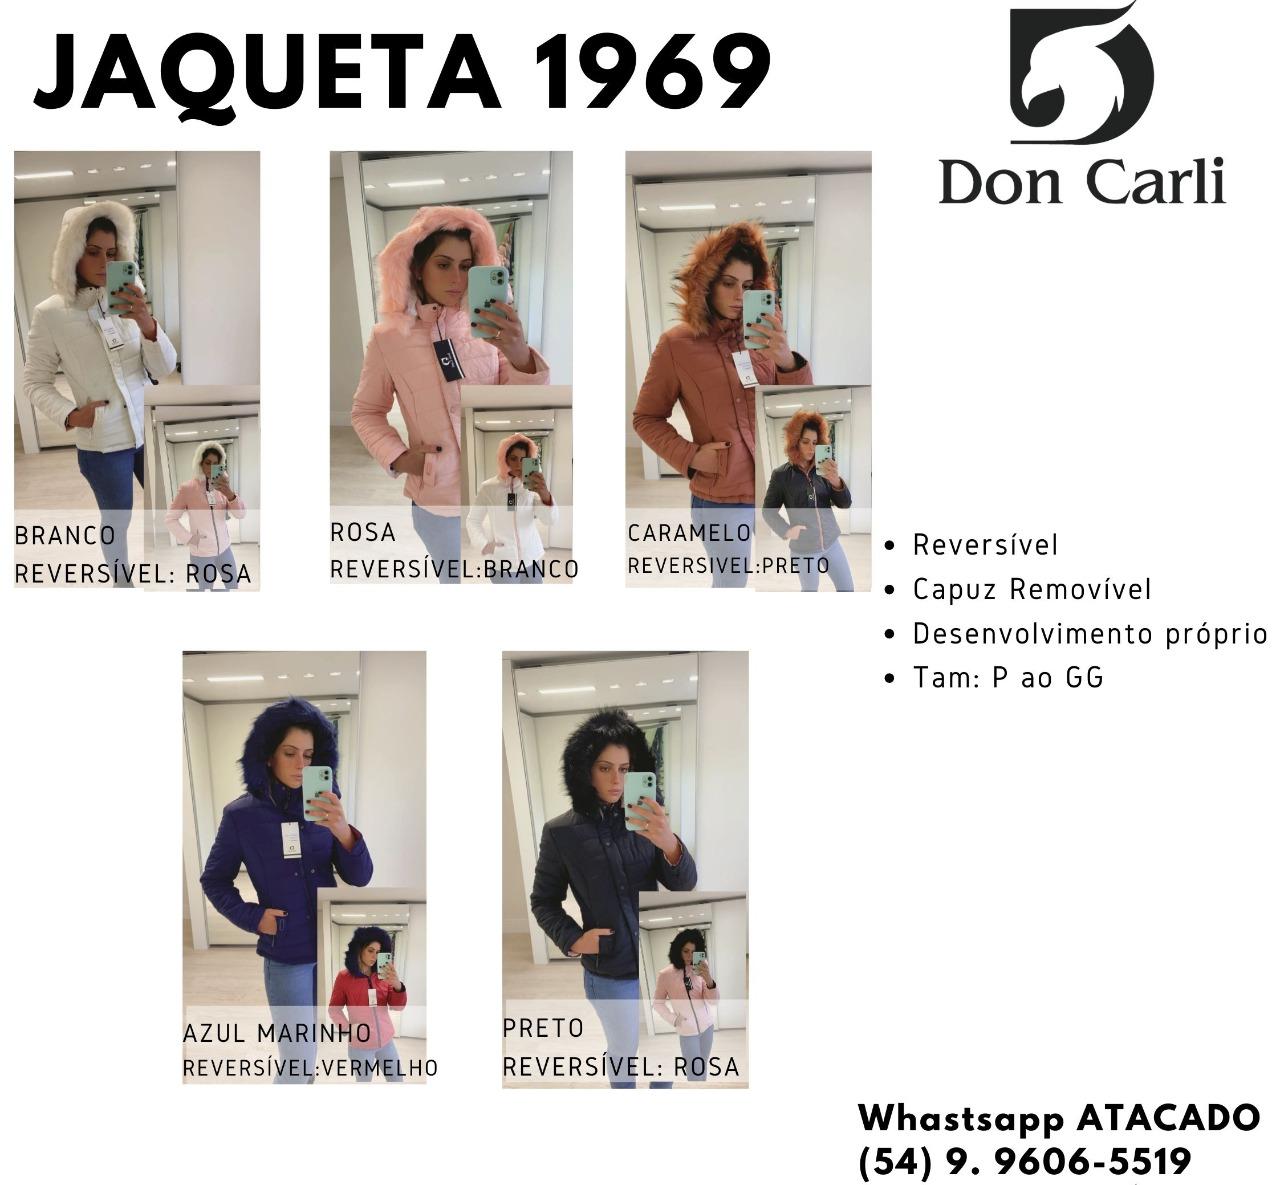 Jaqueta Don Carli 1969